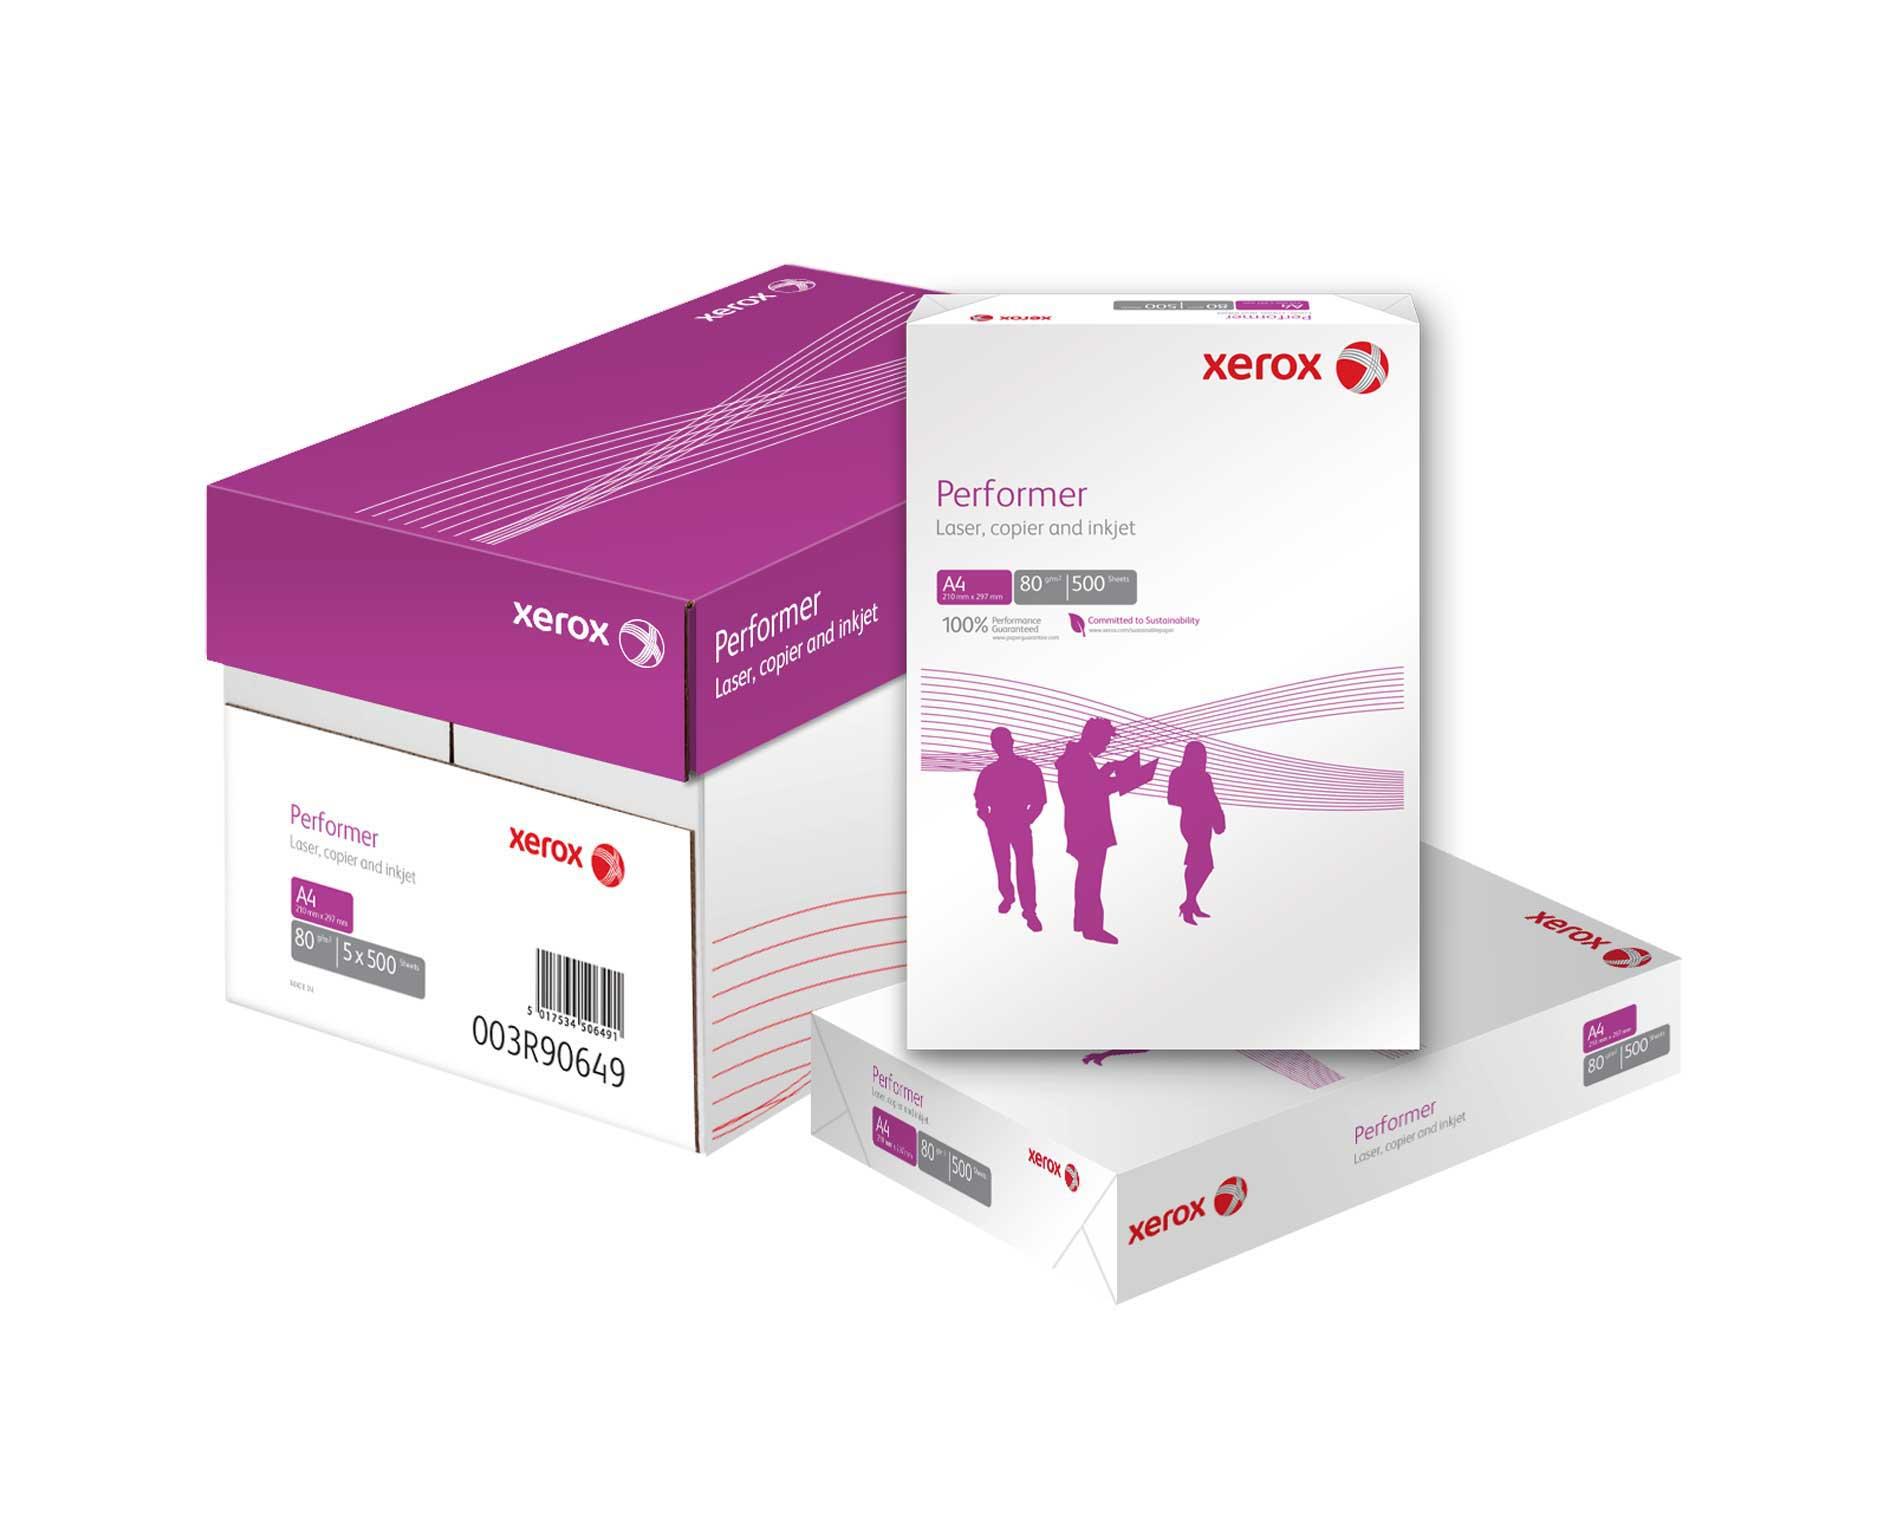 Ofixer Xerox - PERFORMER - Ofixer-Xerox